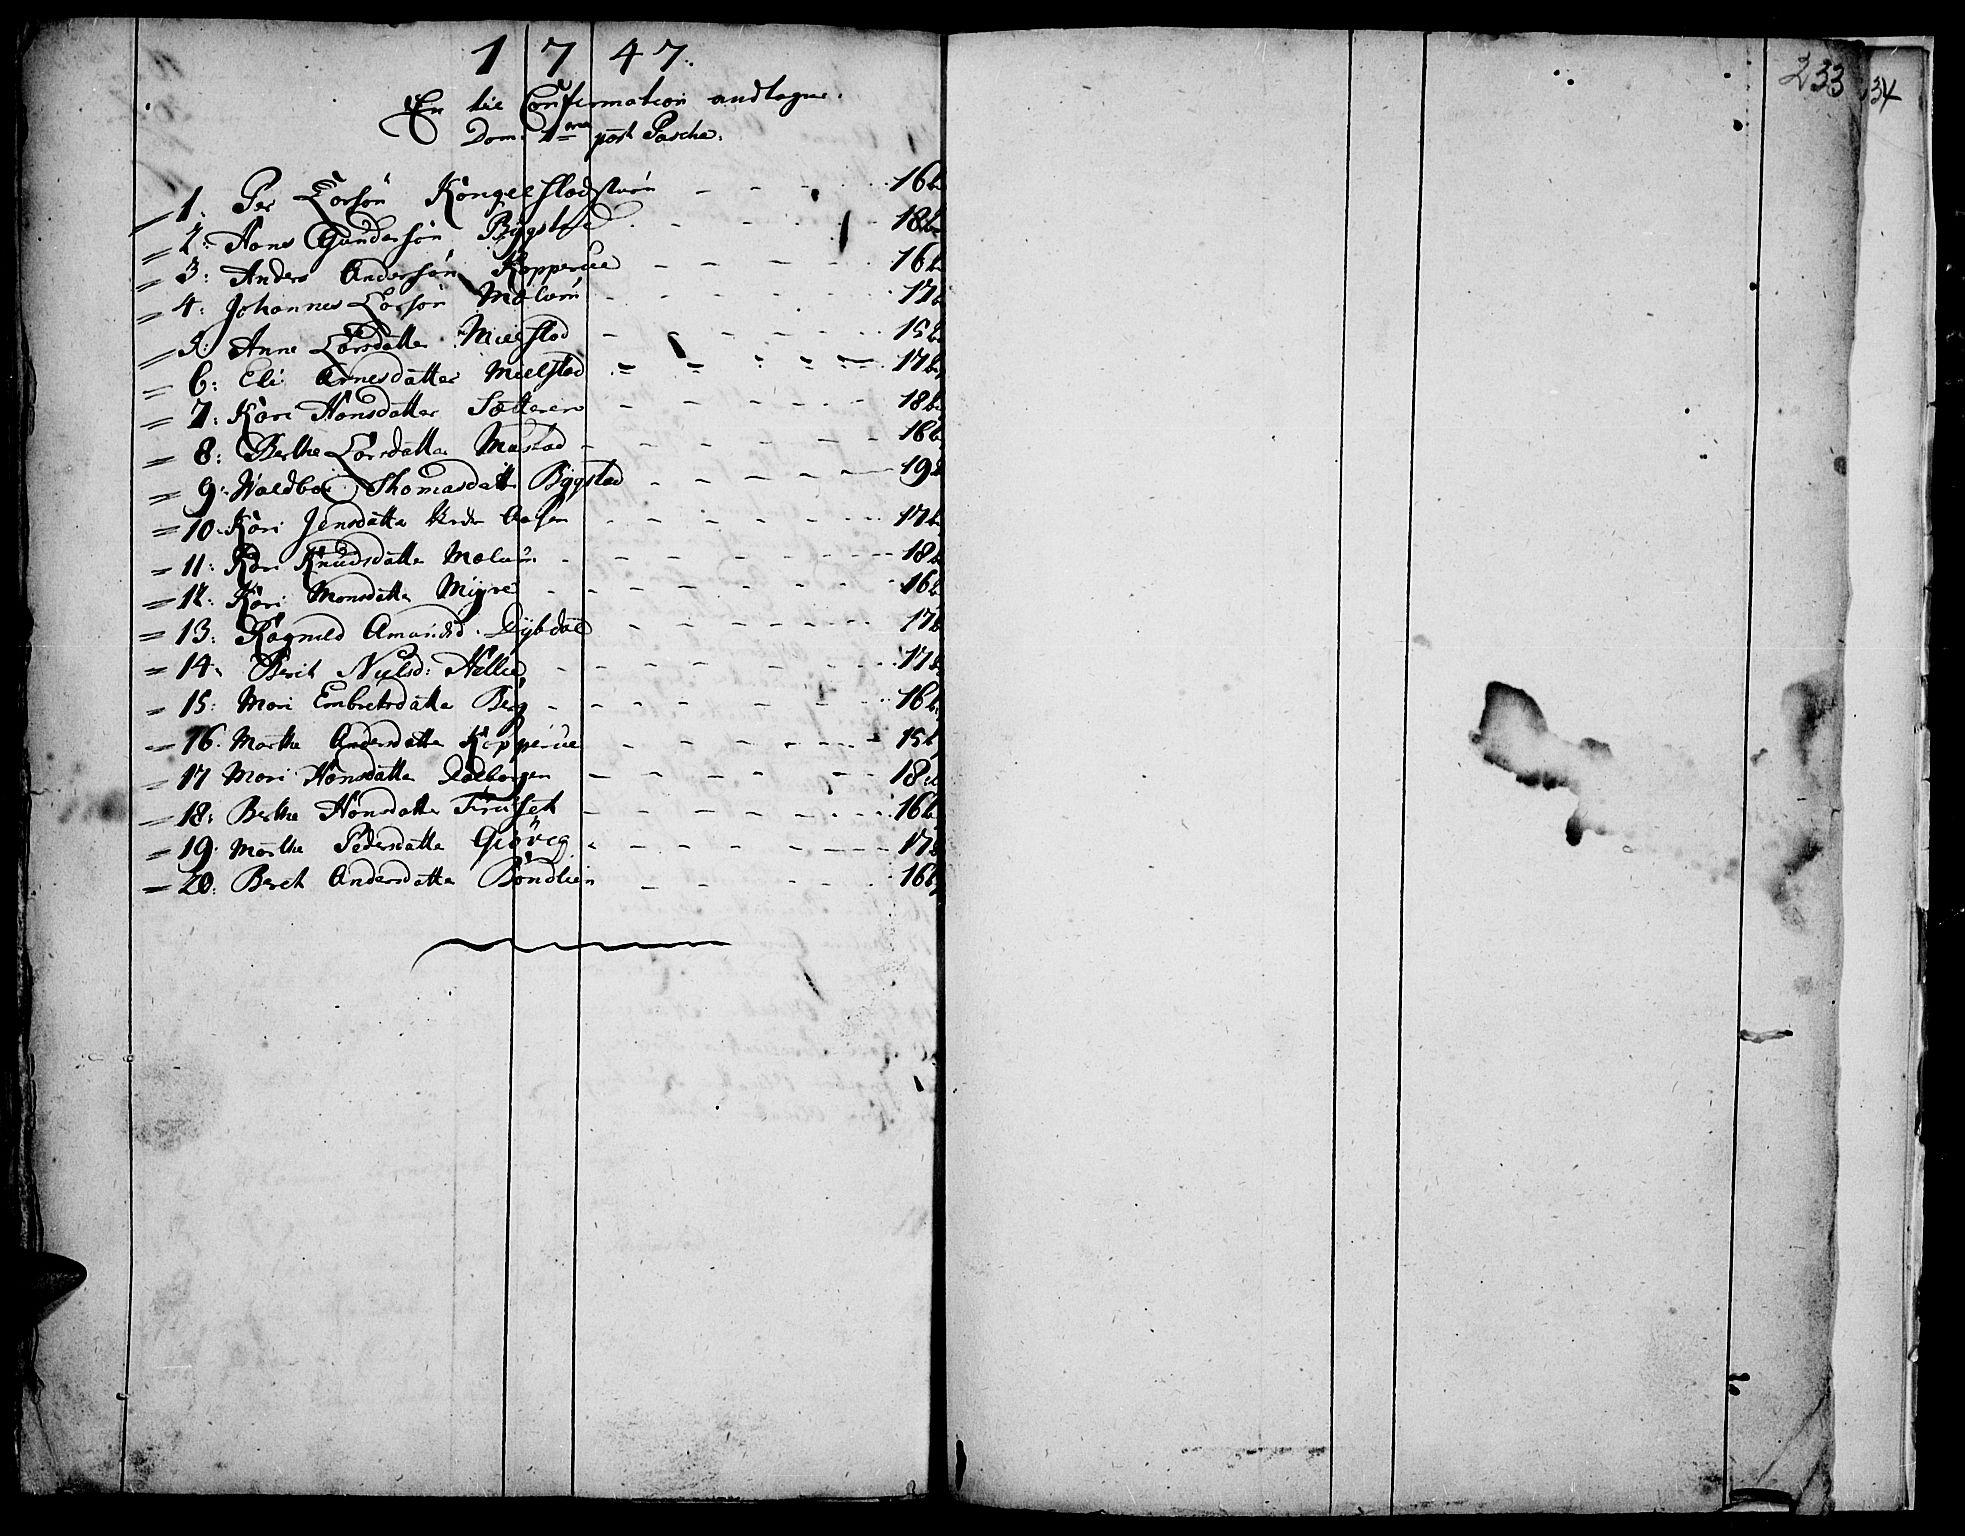 SAH, Vardal prestekontor, H/Ha/Haa/L0001: Ministerialbok nr. 1, 1706-1748, s. 233